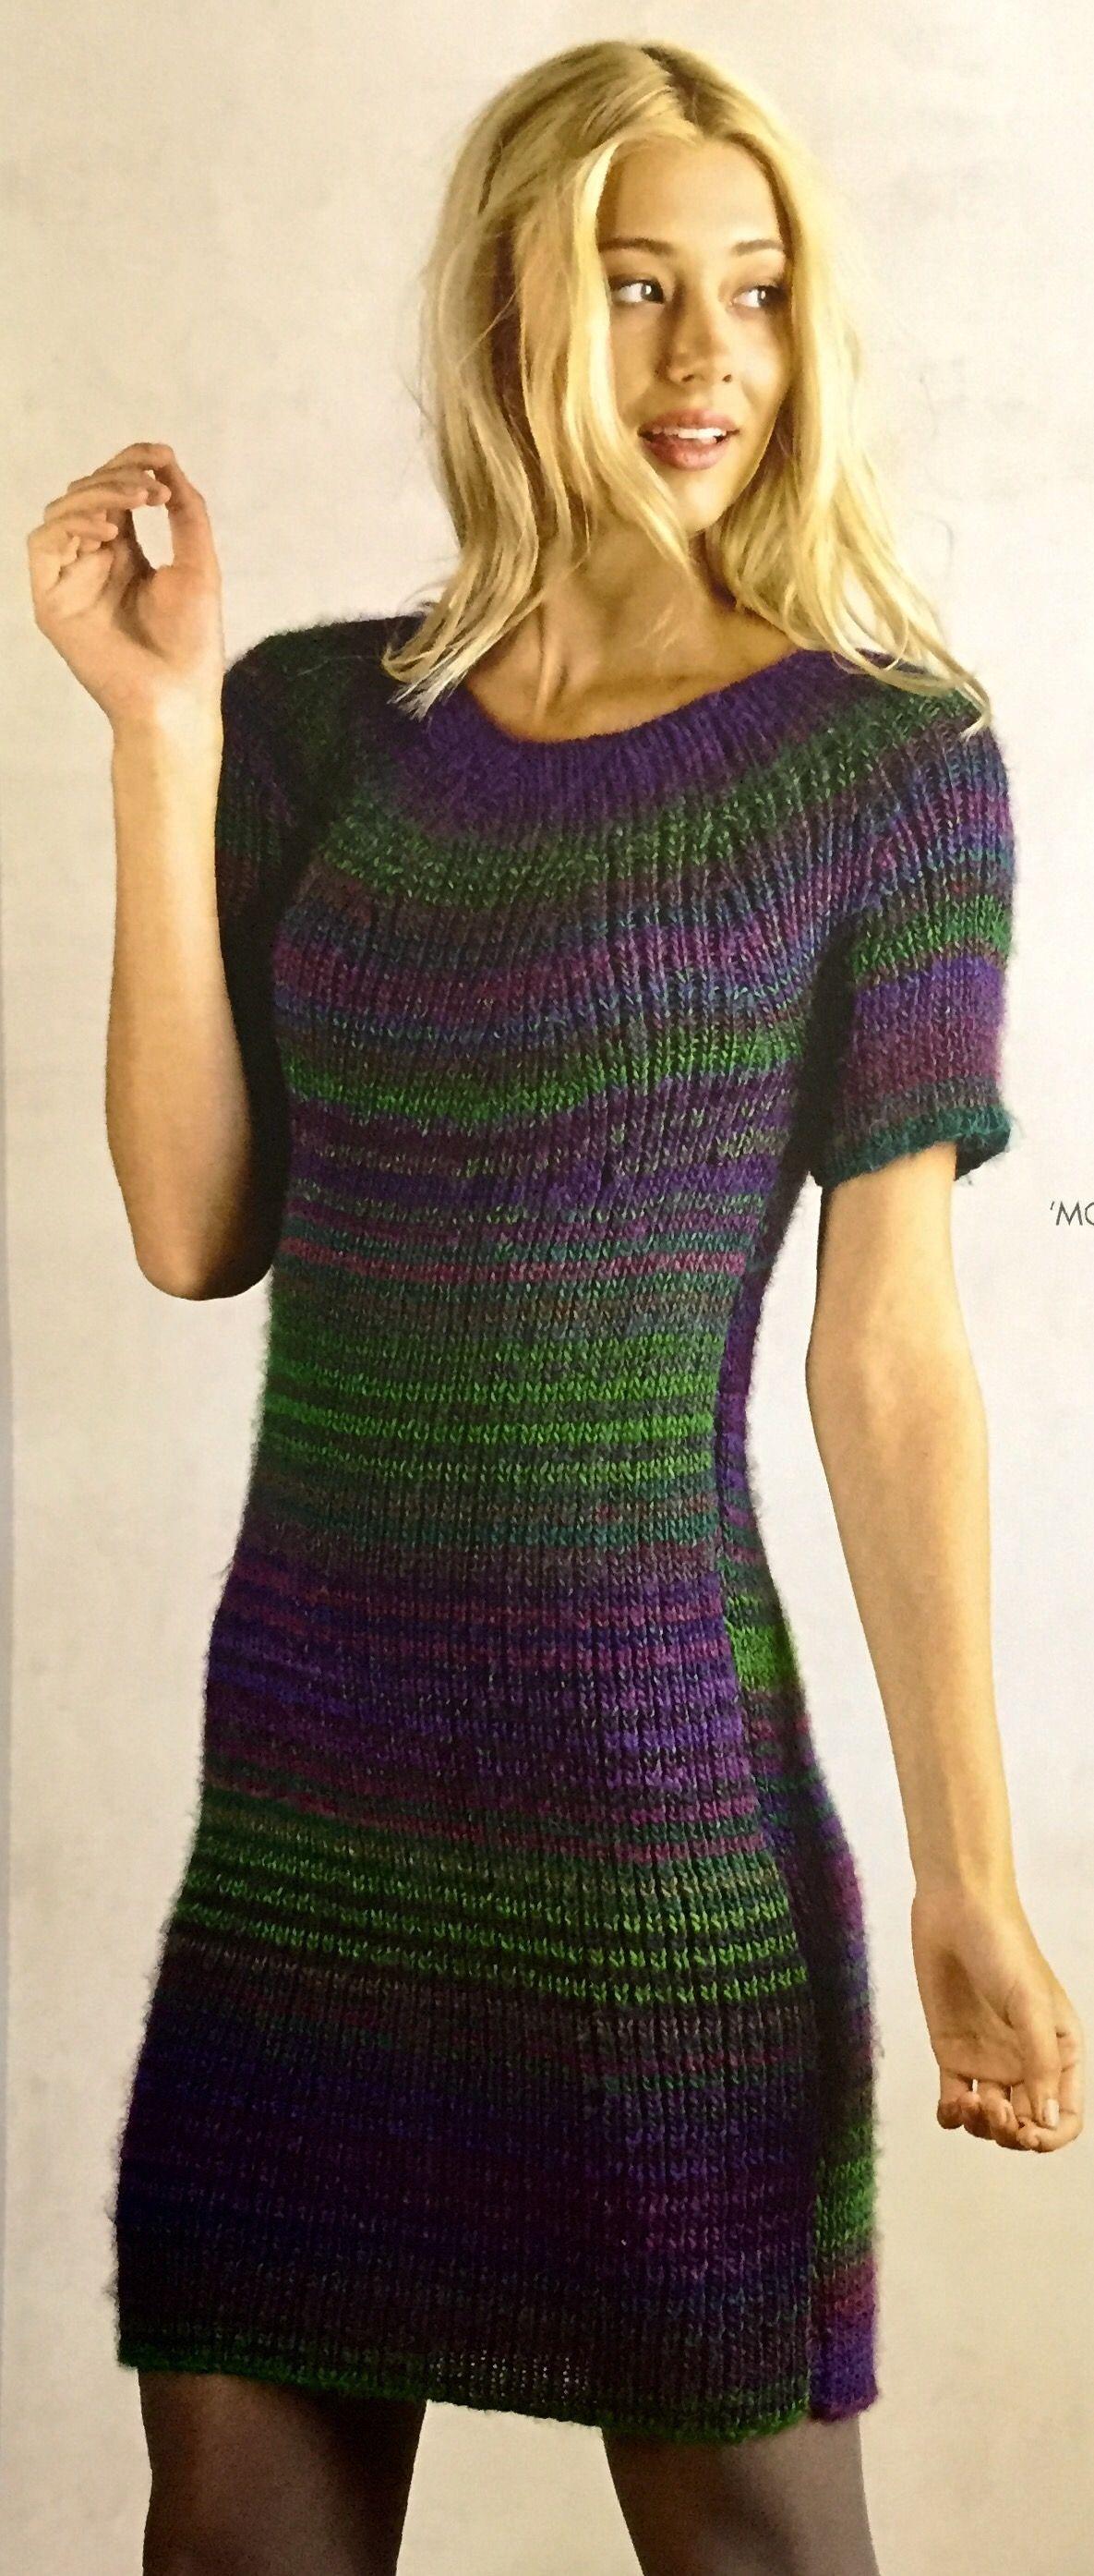 444d9e31bac2 Bouvardia Ribbed Dress. Knitted dress. Spotlight Easy as Yarn magazine Winter  2016. Moda Vera Bouvardia 10-12 ply 180m/100g x 6